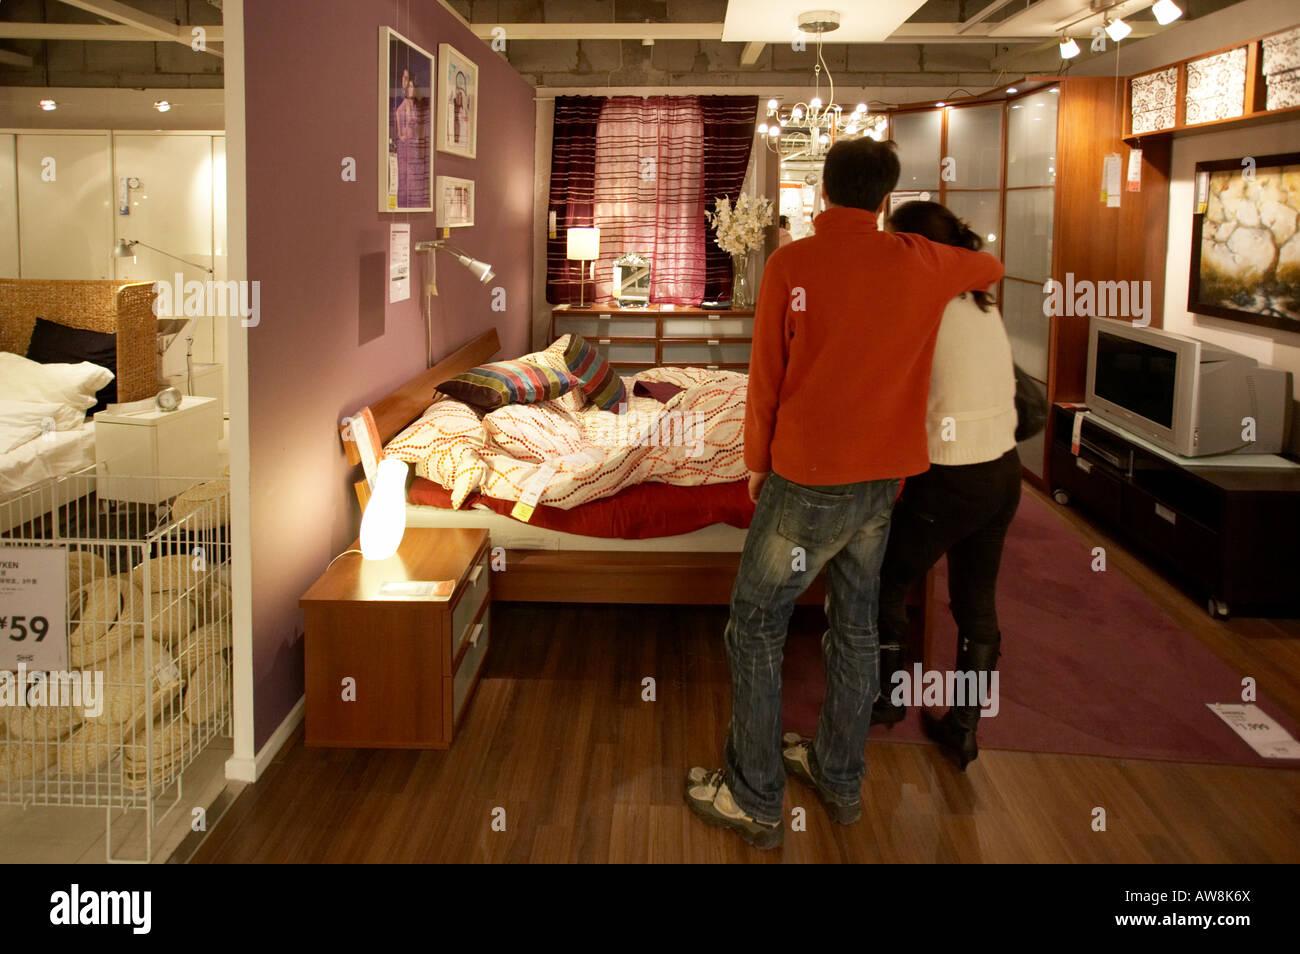 Ikea Shoppers Fotos e Imágenes de stock Alamy